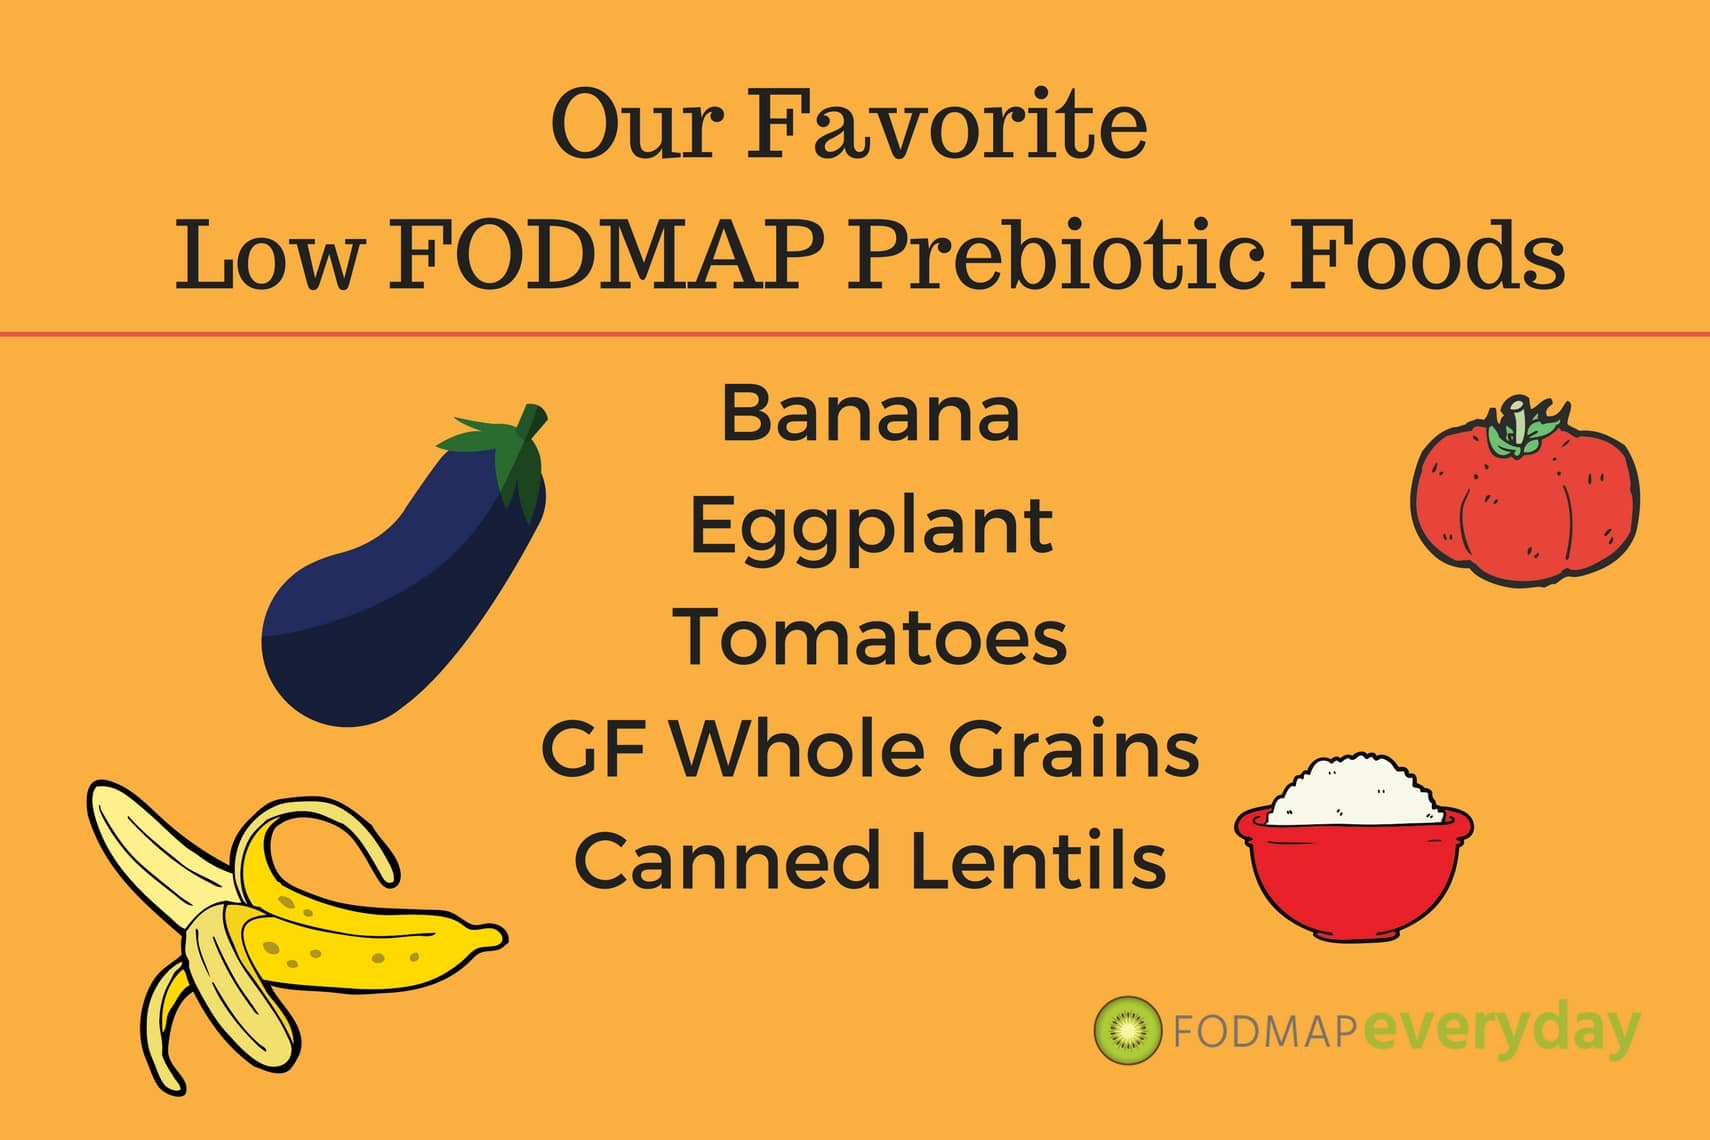 Our Favorite Low FODMAP Prebiotic Foods